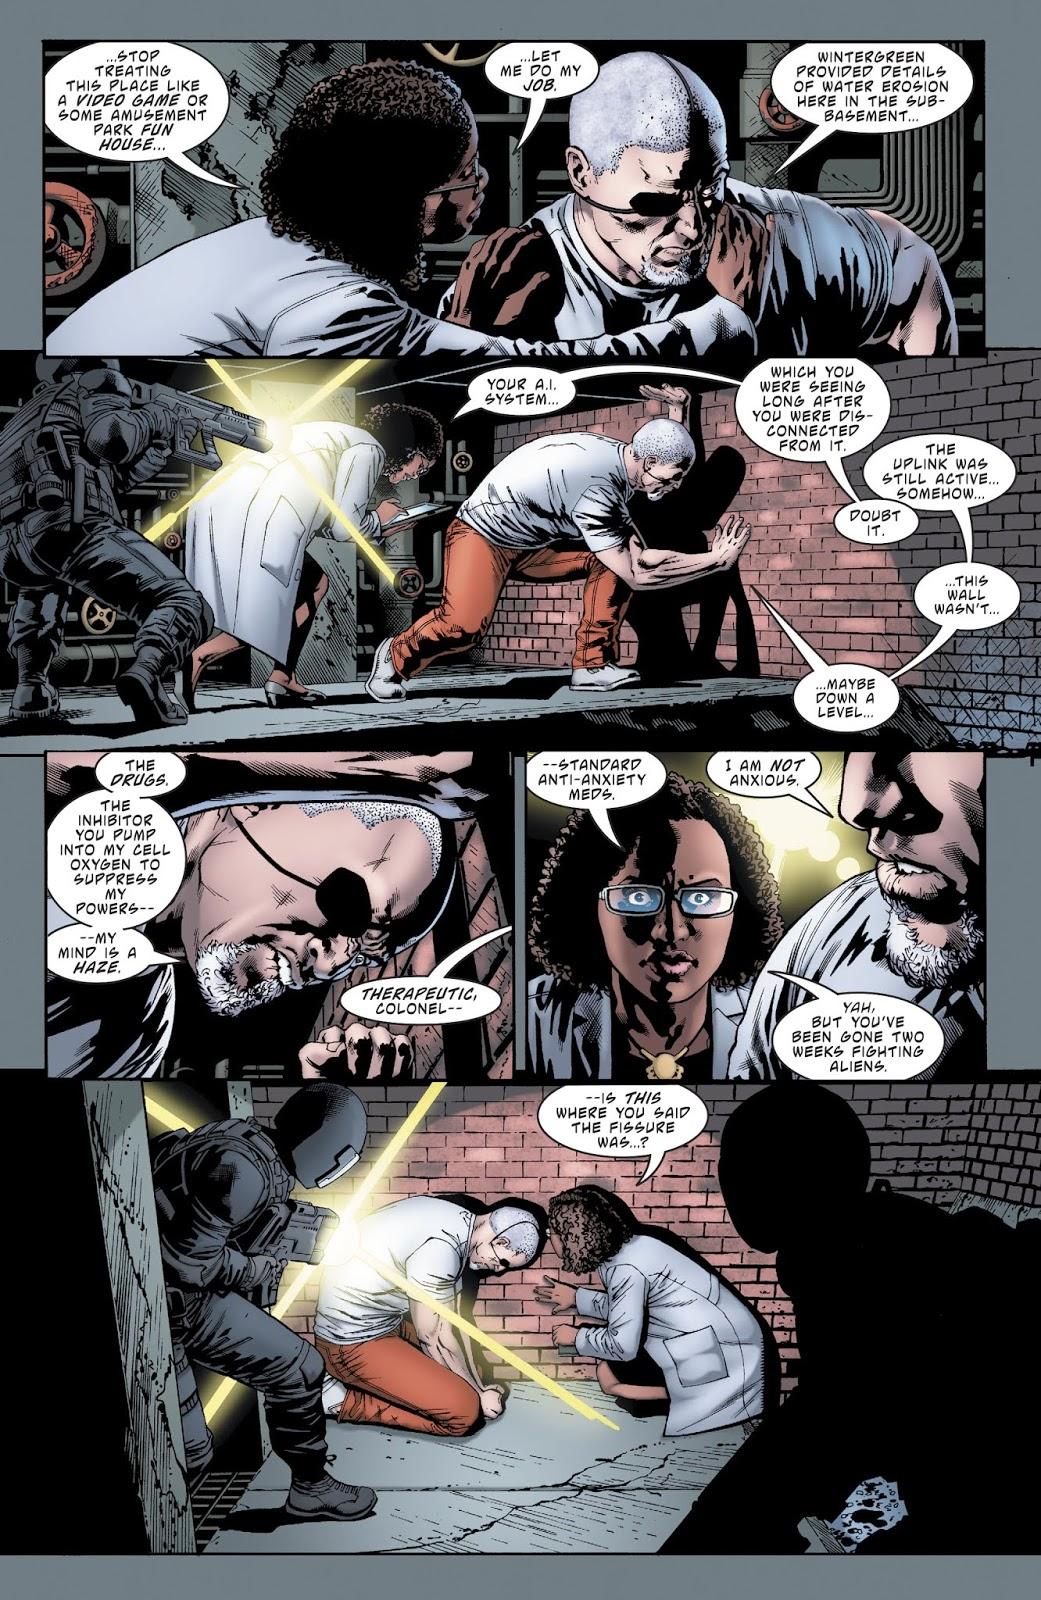 Deathstroke V7 Arkham review